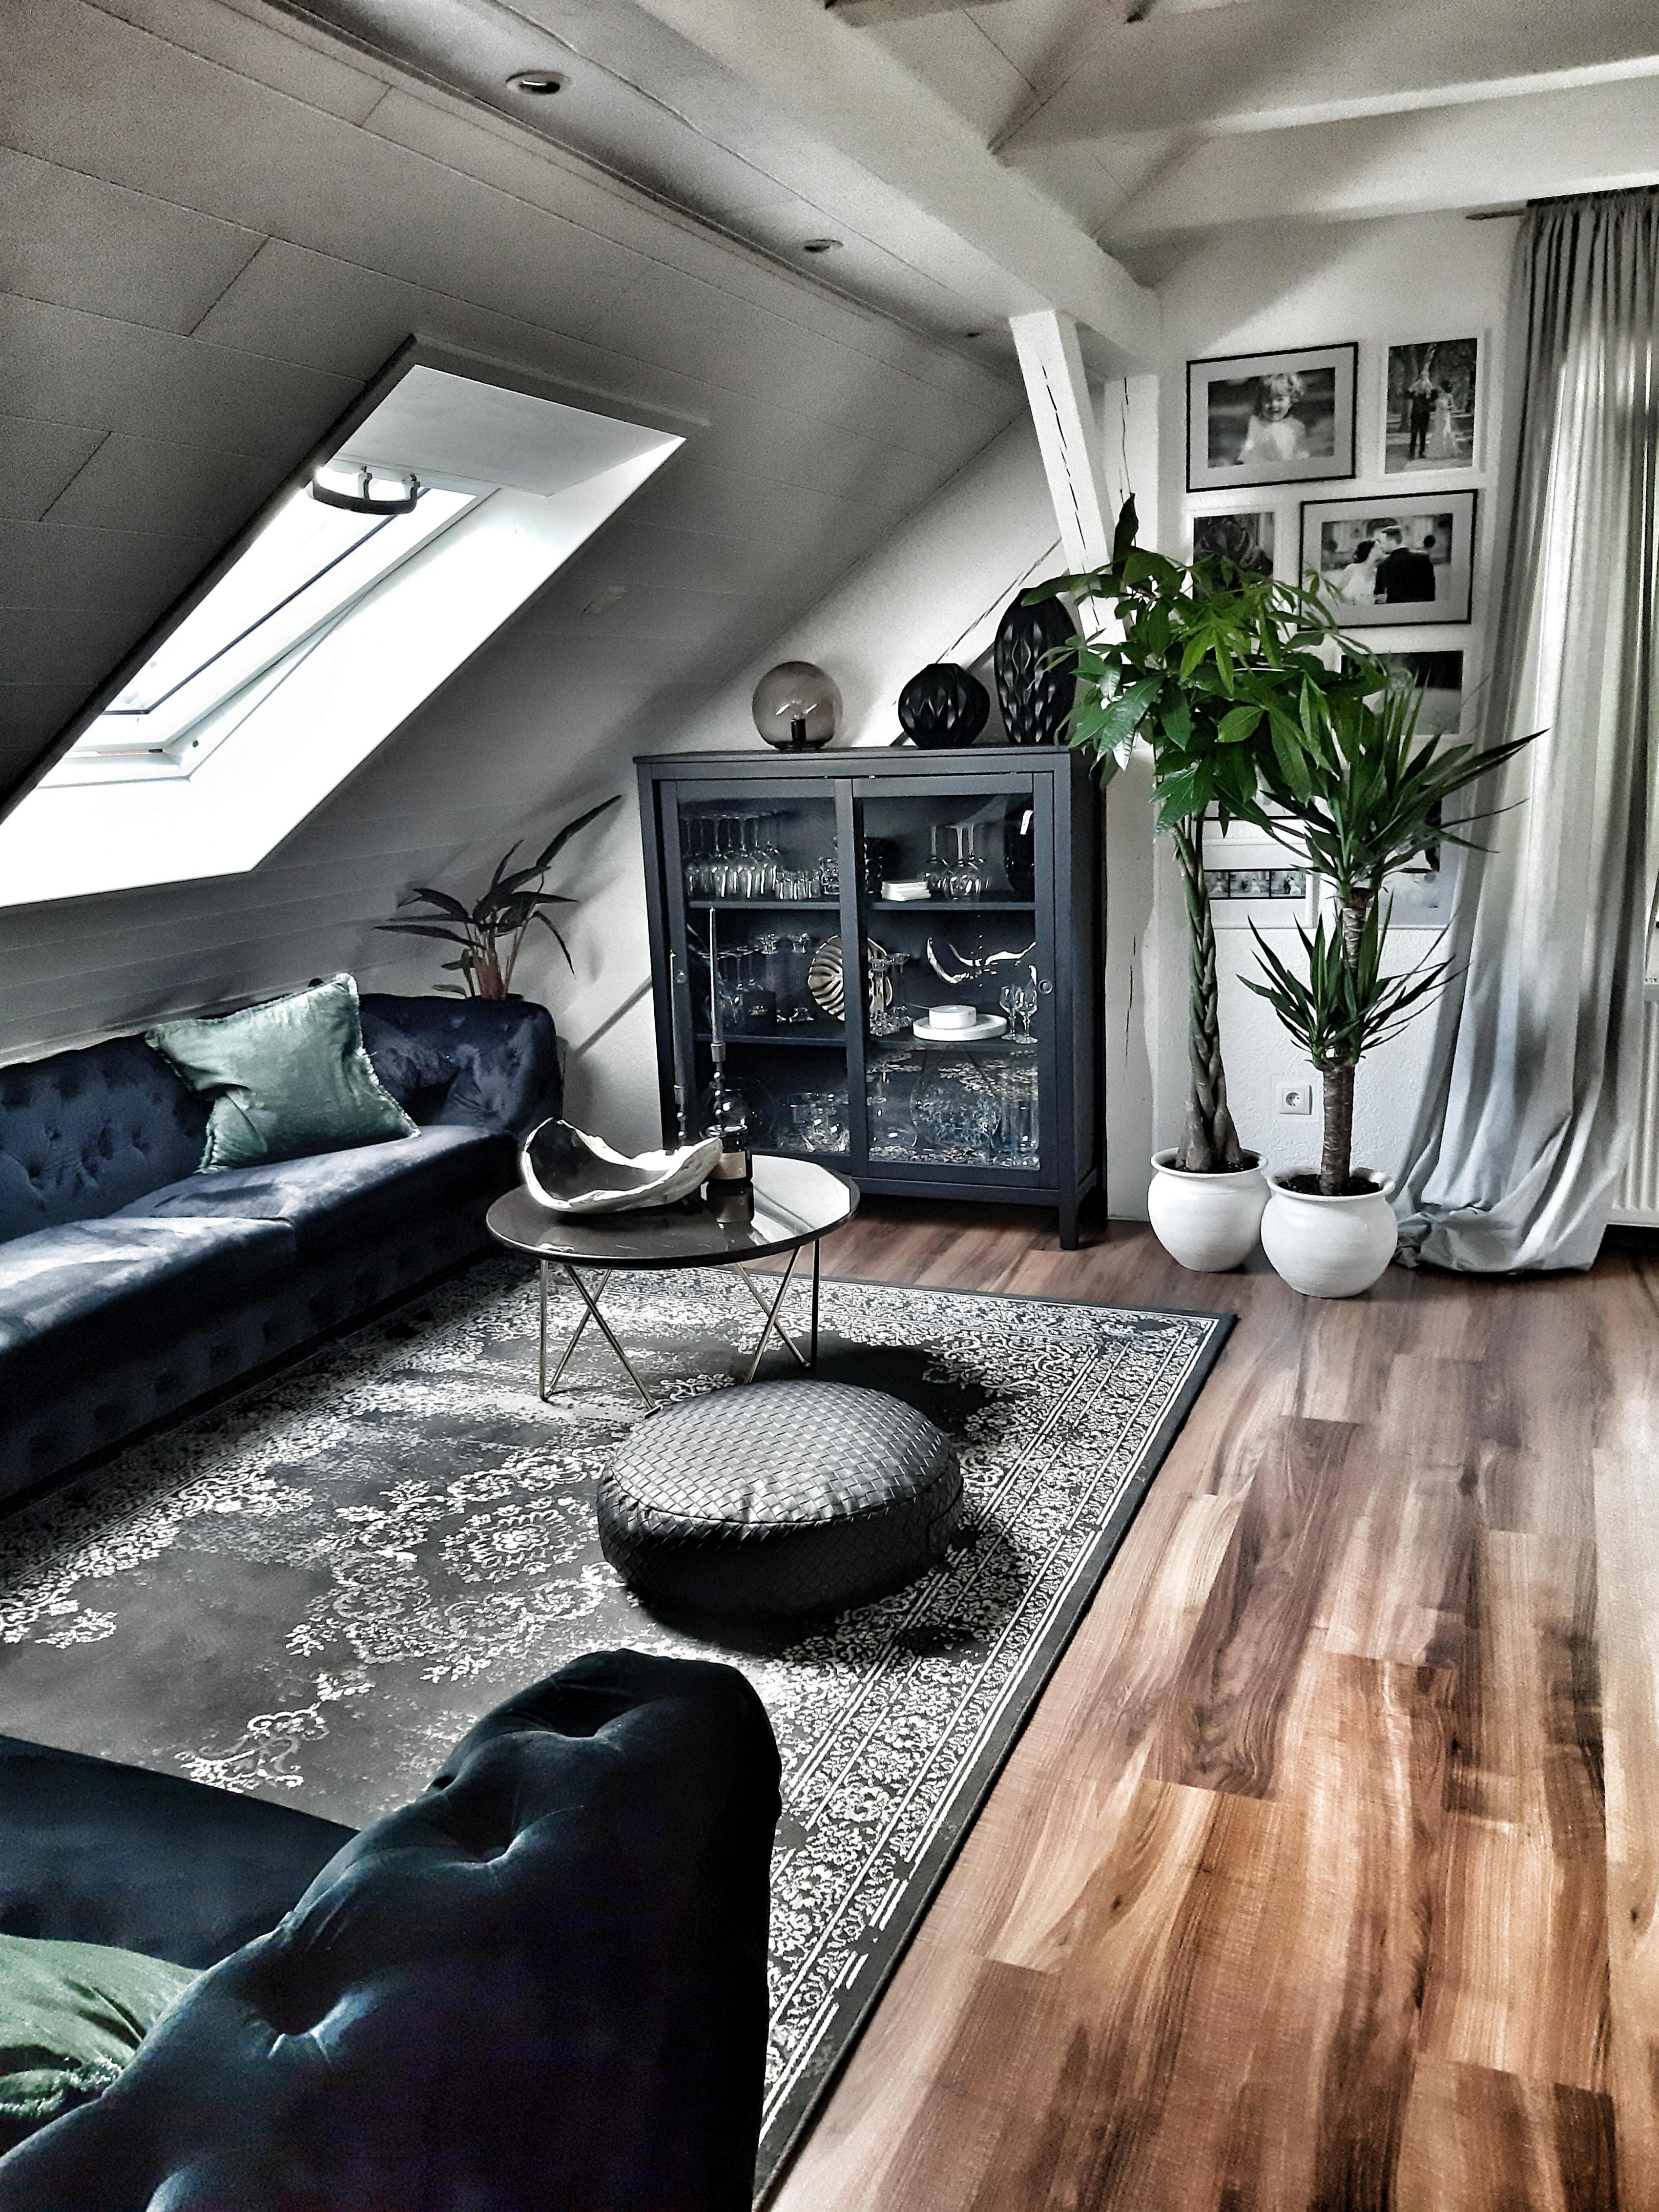 Dachgeschoss Schlafzimmer Ideen – Caseconrad von Dachgeschoss Wohnzimmer Ideen Photo